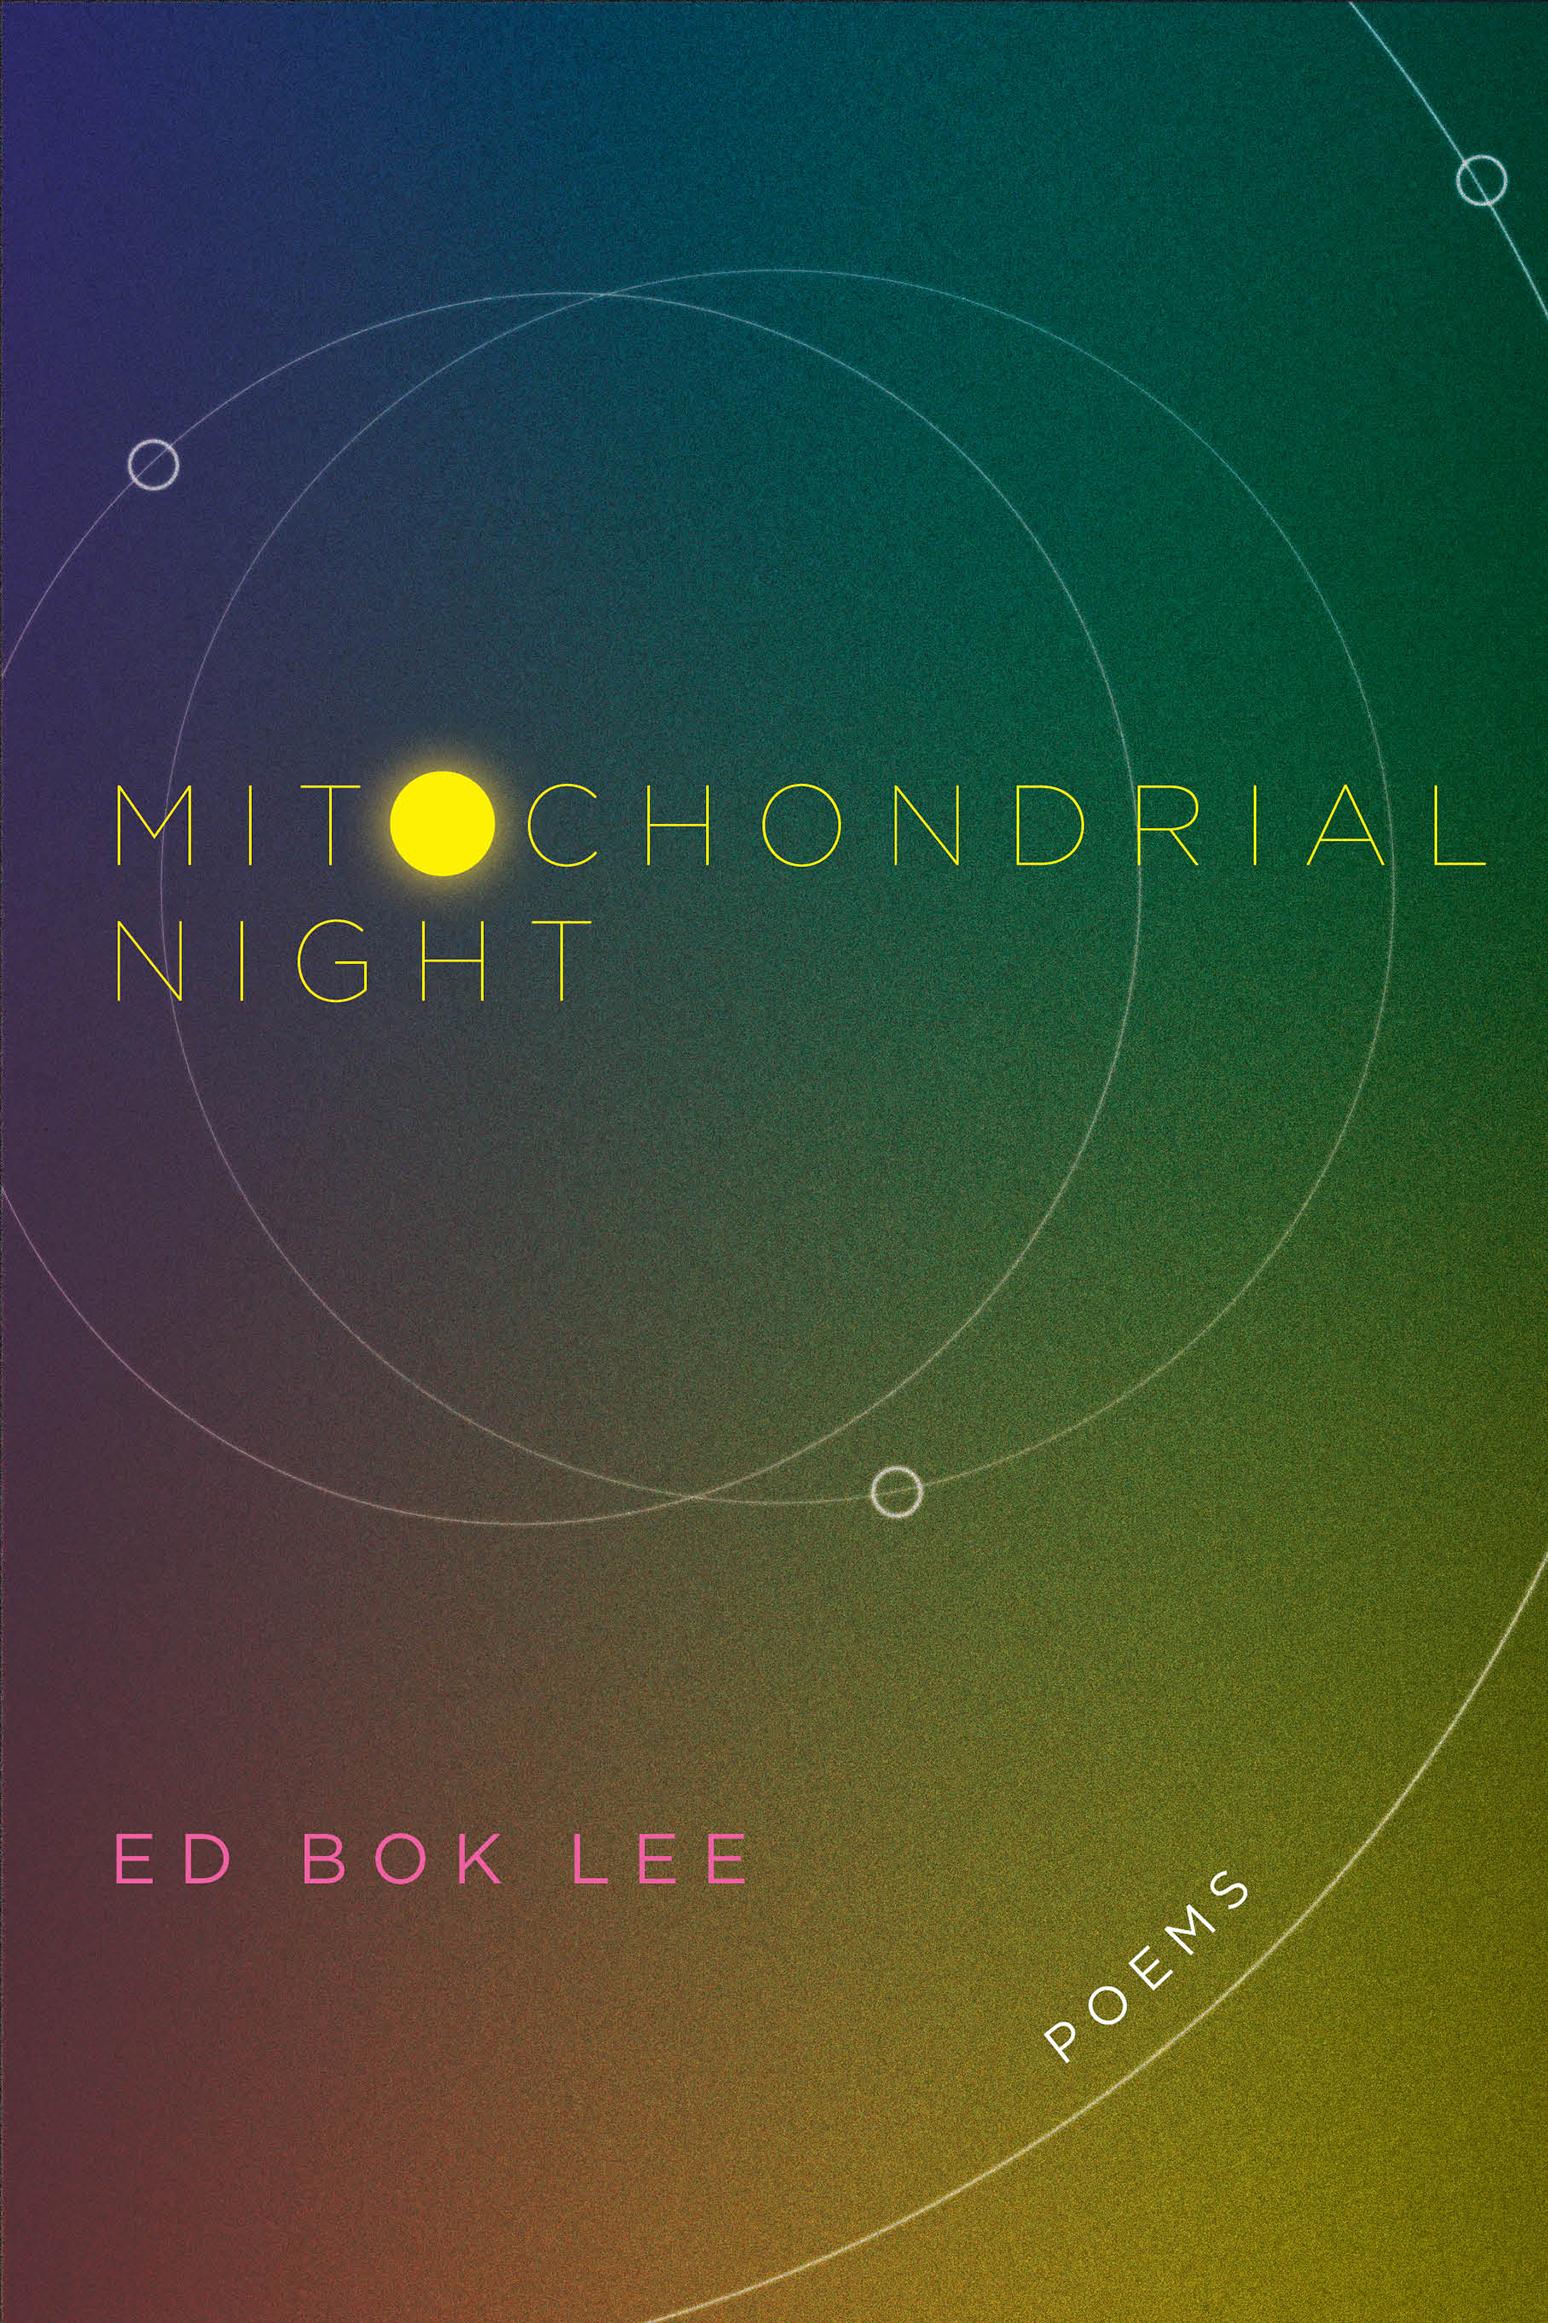 Mitochondrial_Night_FC.jpg